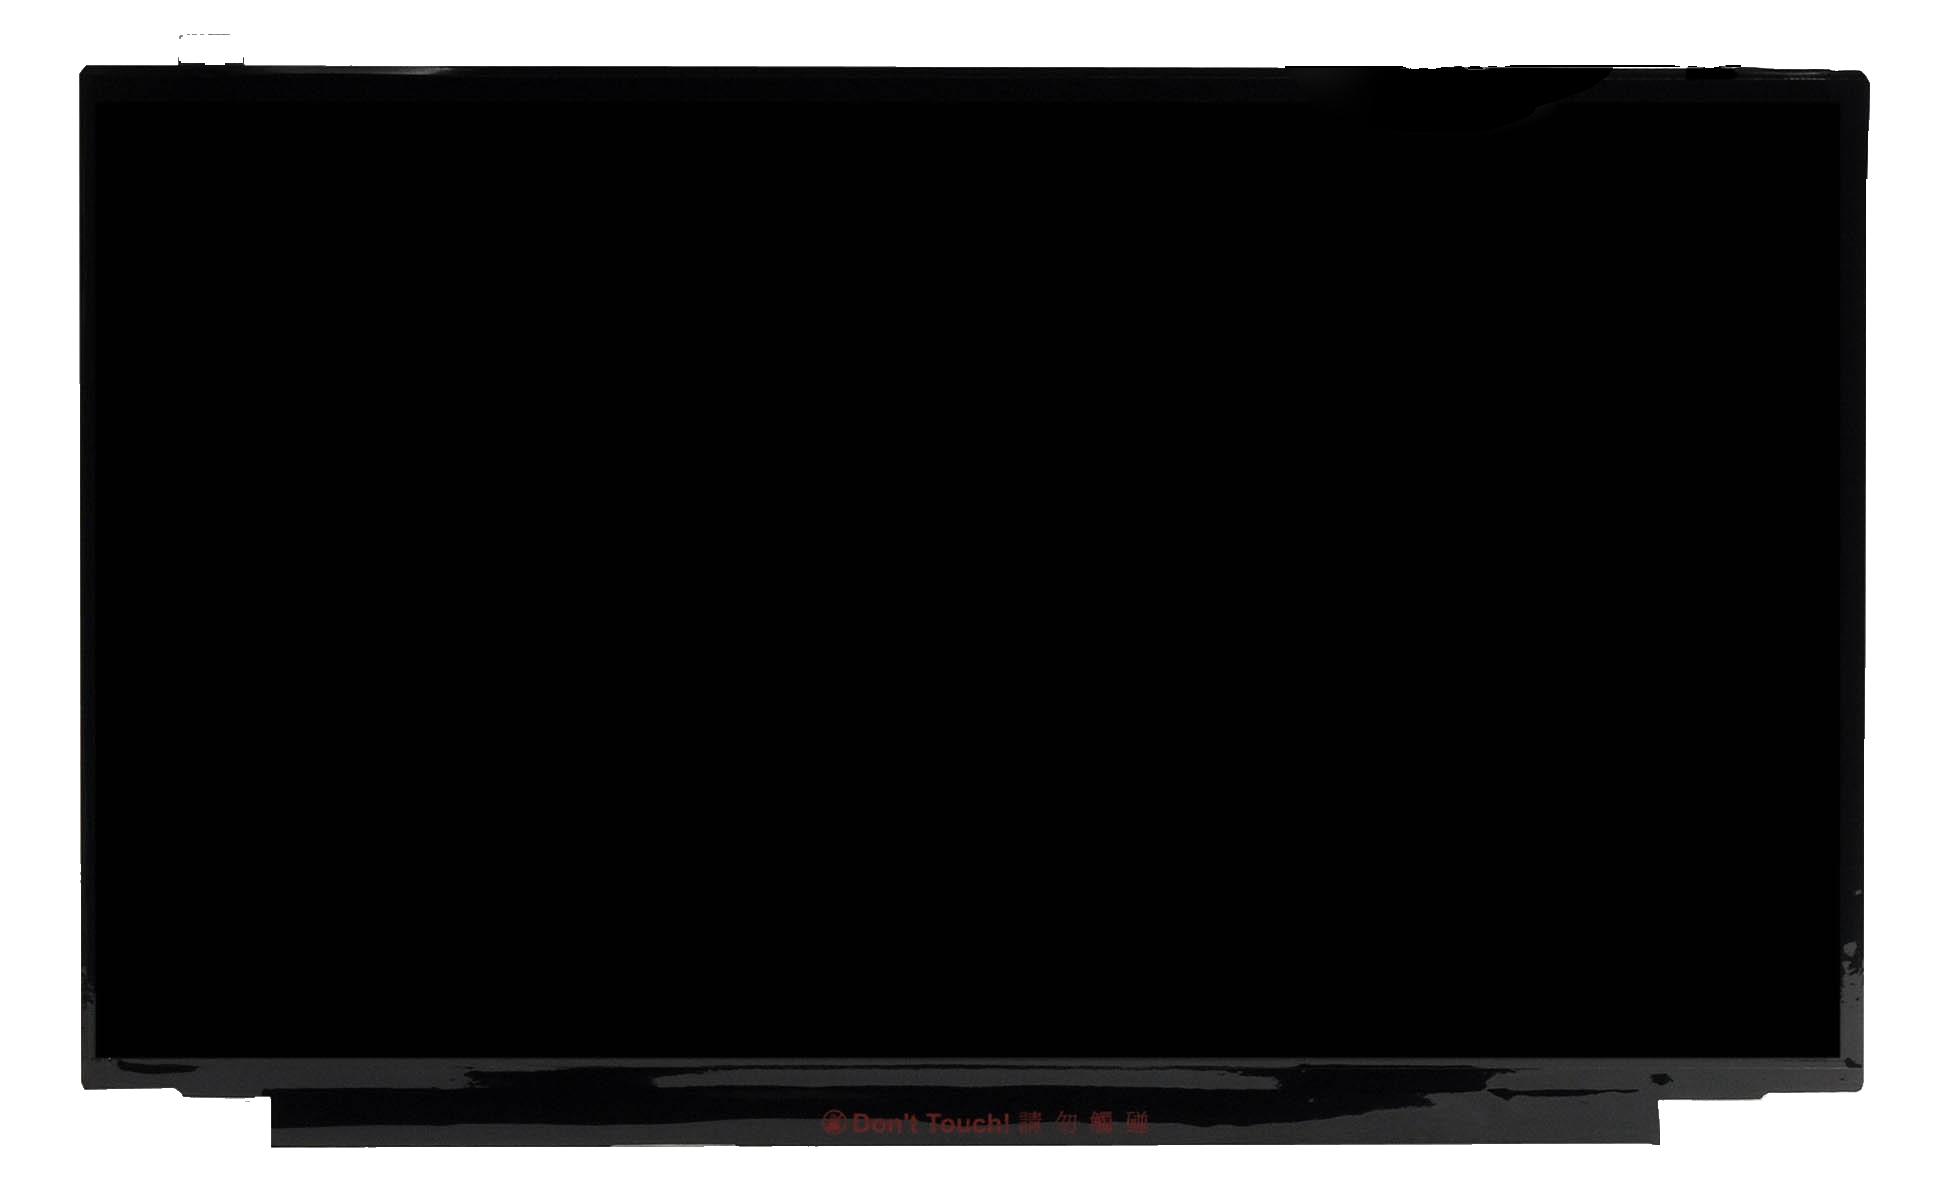 Sony Vaio Dizüstü Ekran